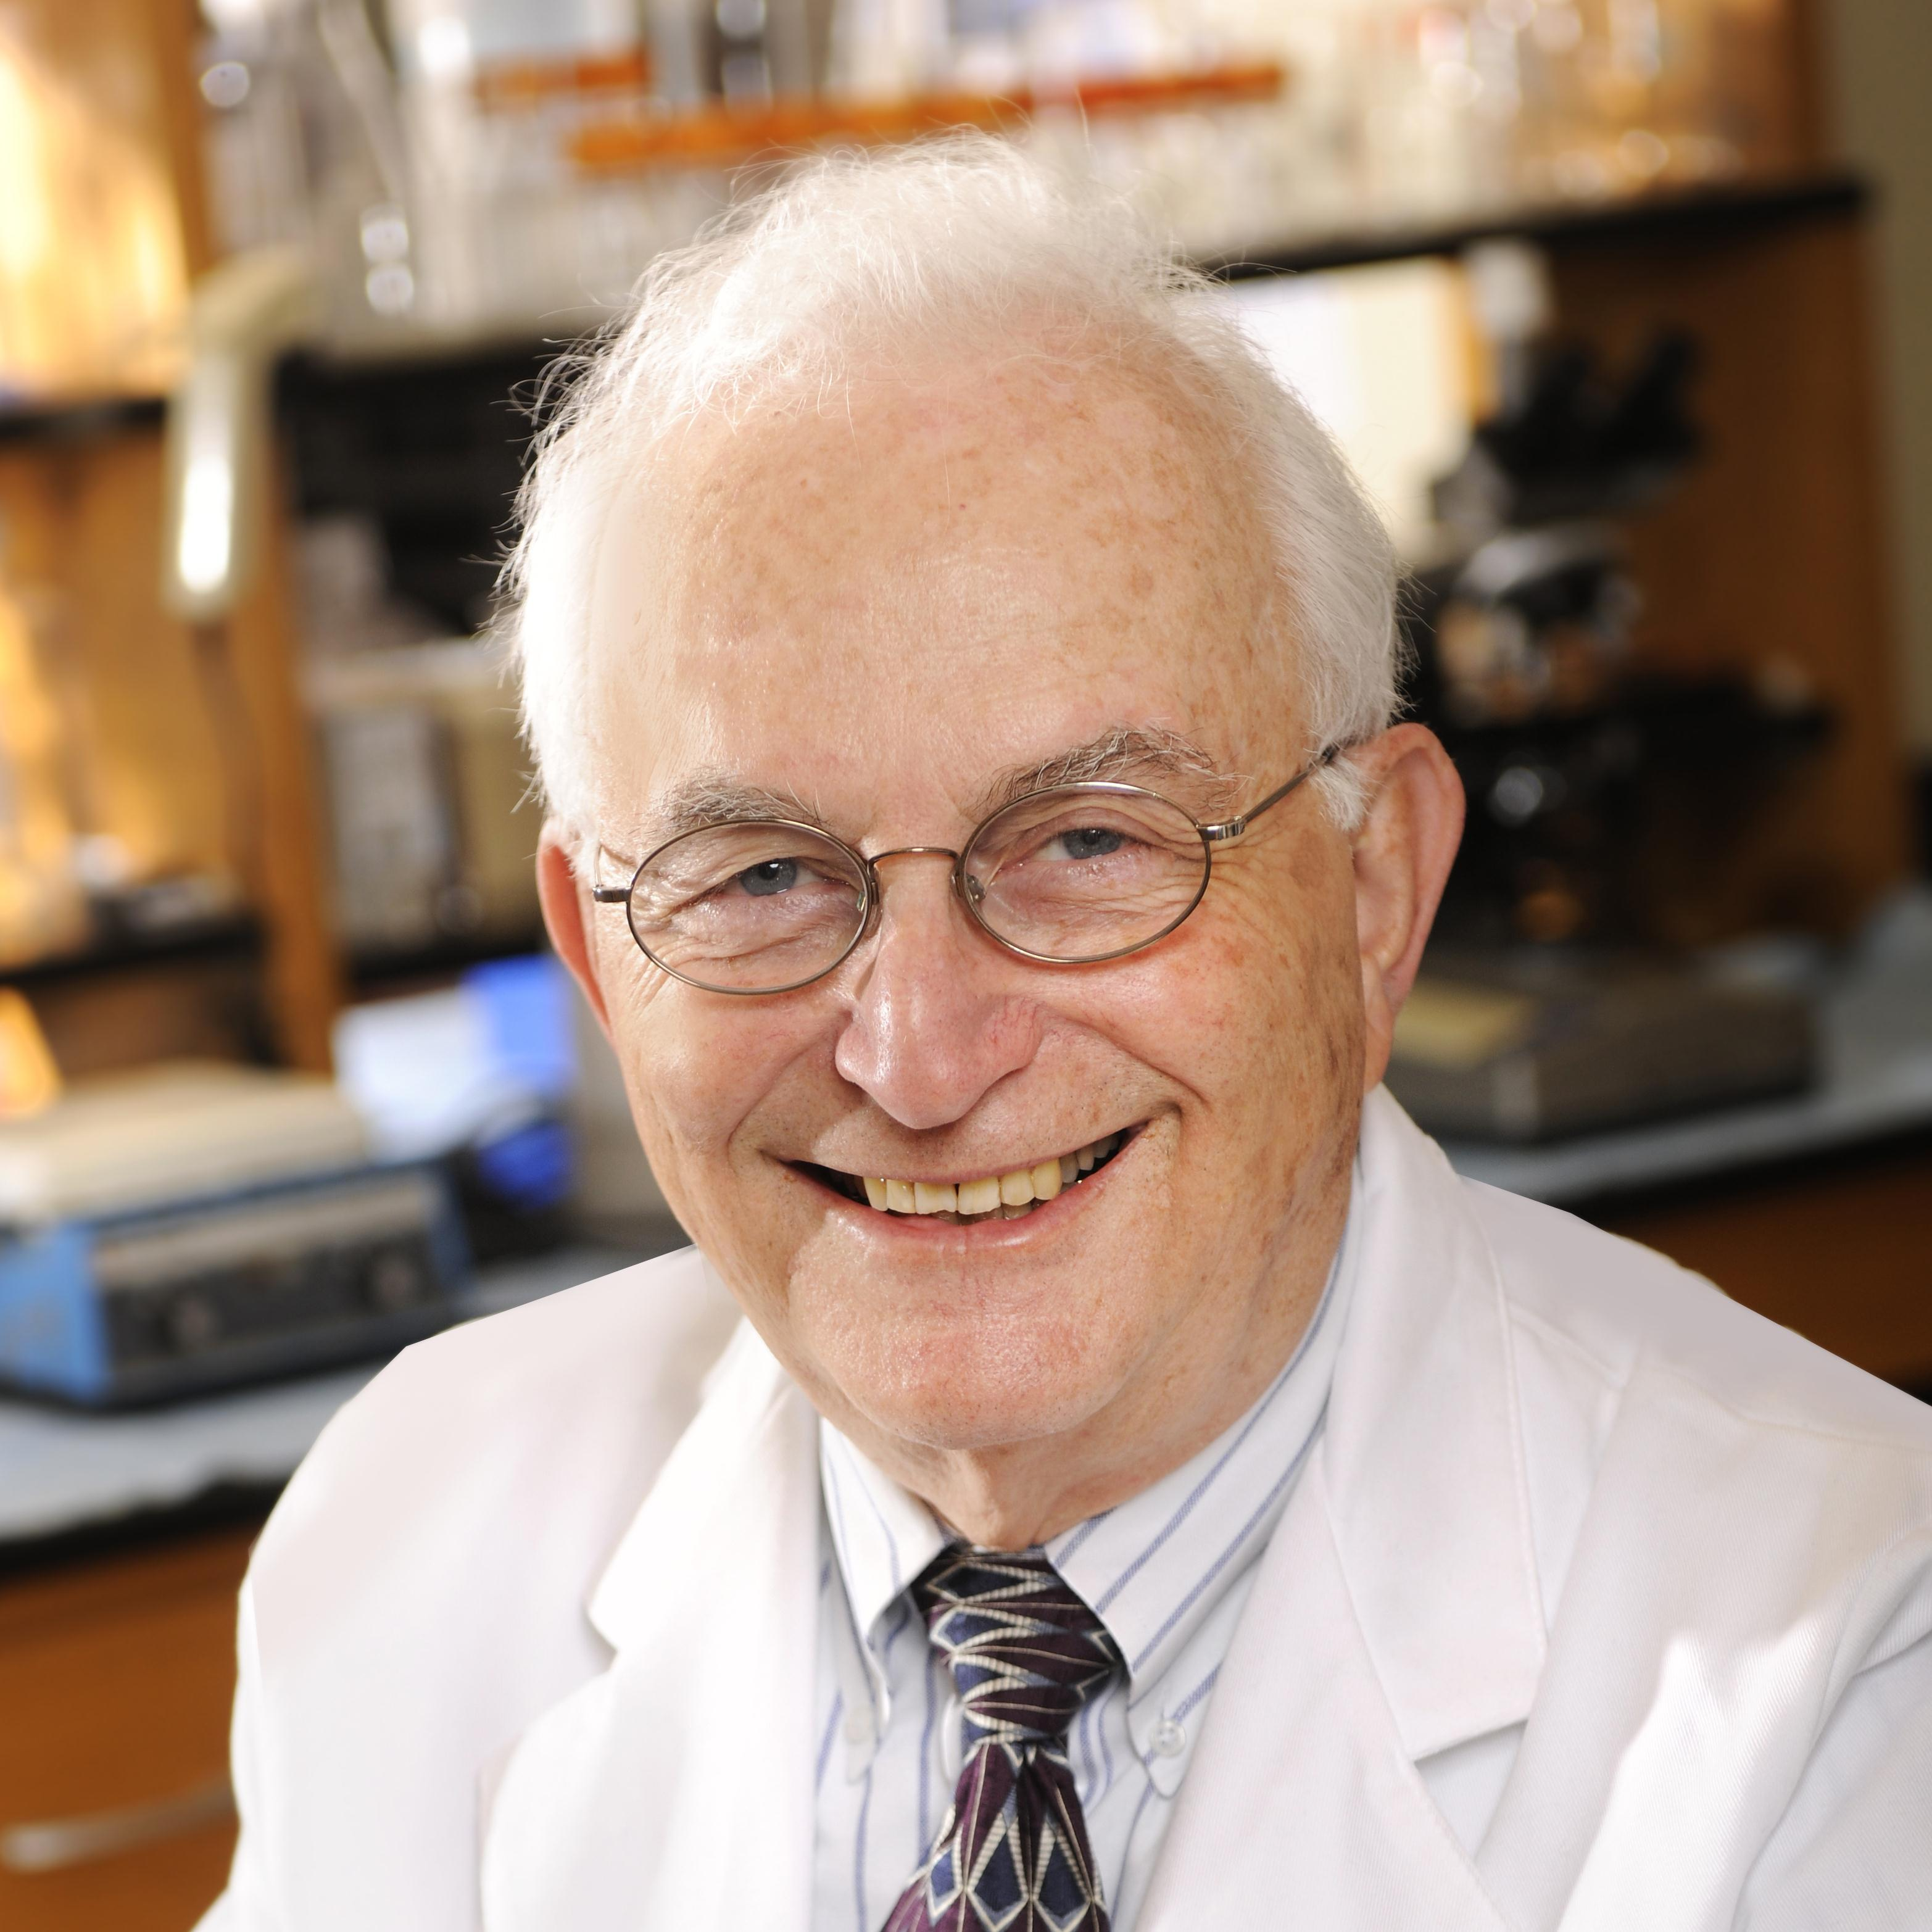 Donald Stein Ph.D.